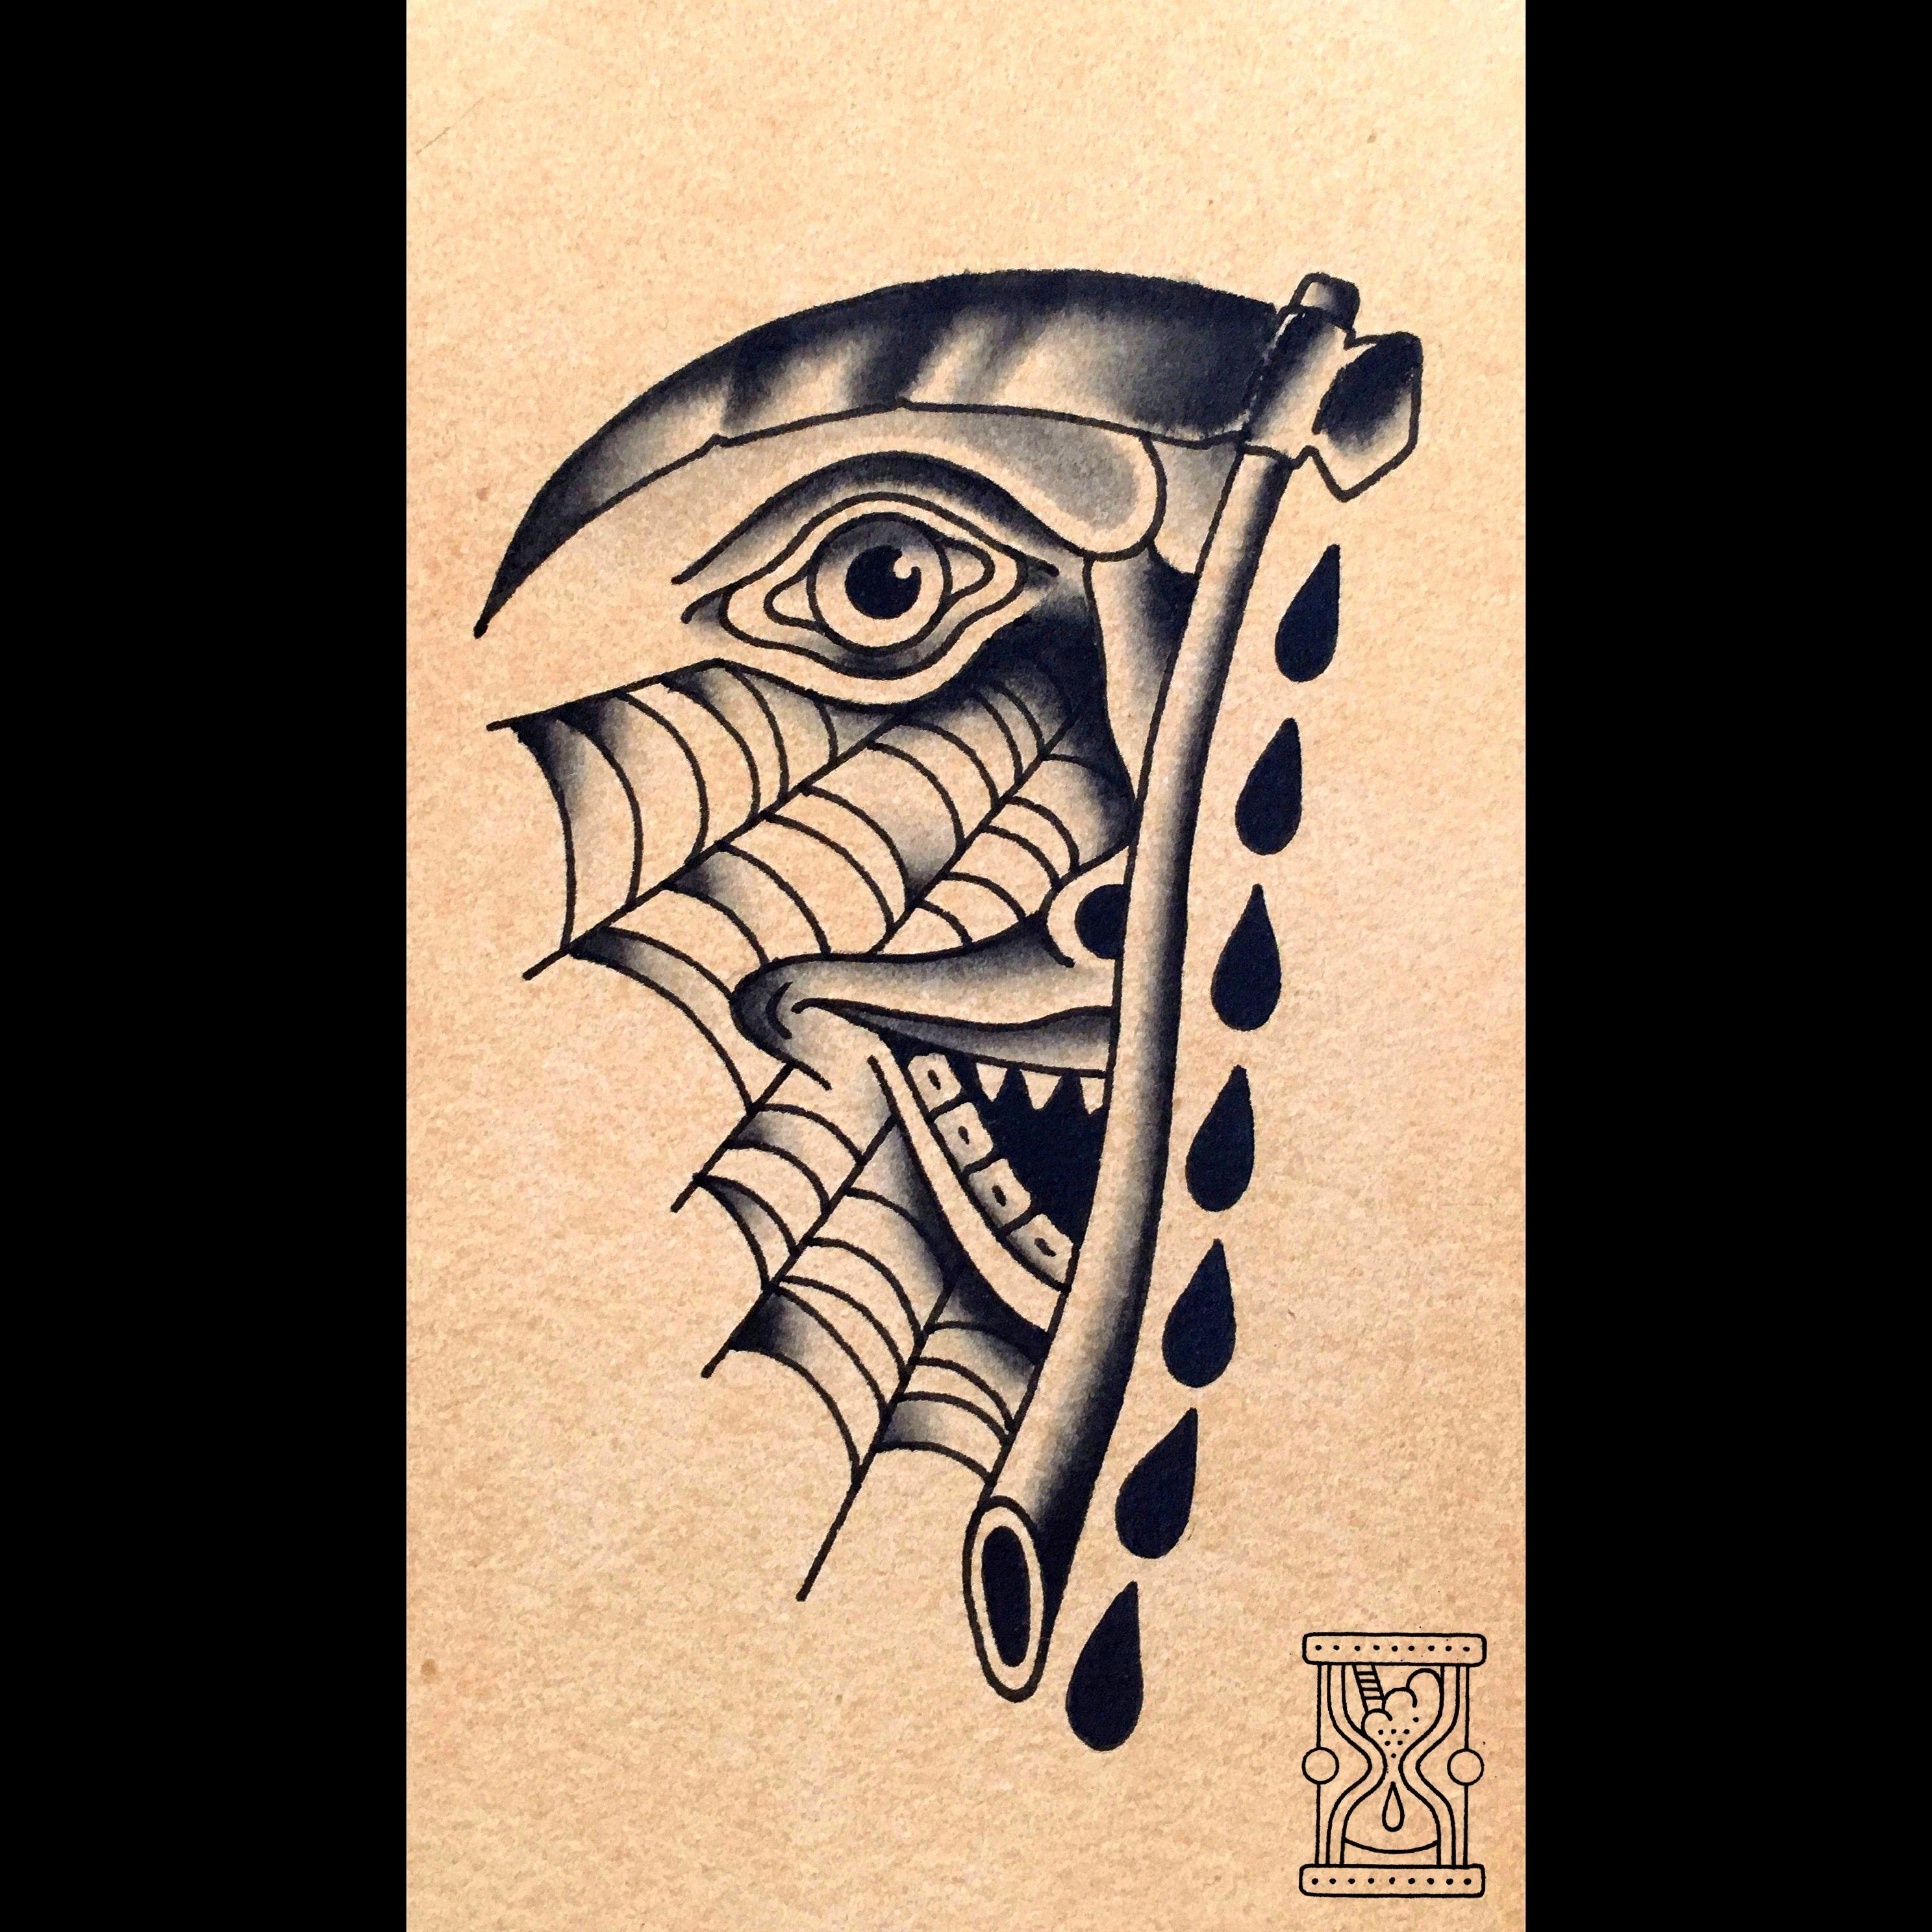 Bocetos De Tatuajes Tradicionales old black tatt | tatuajes inteligentes, tatuajes